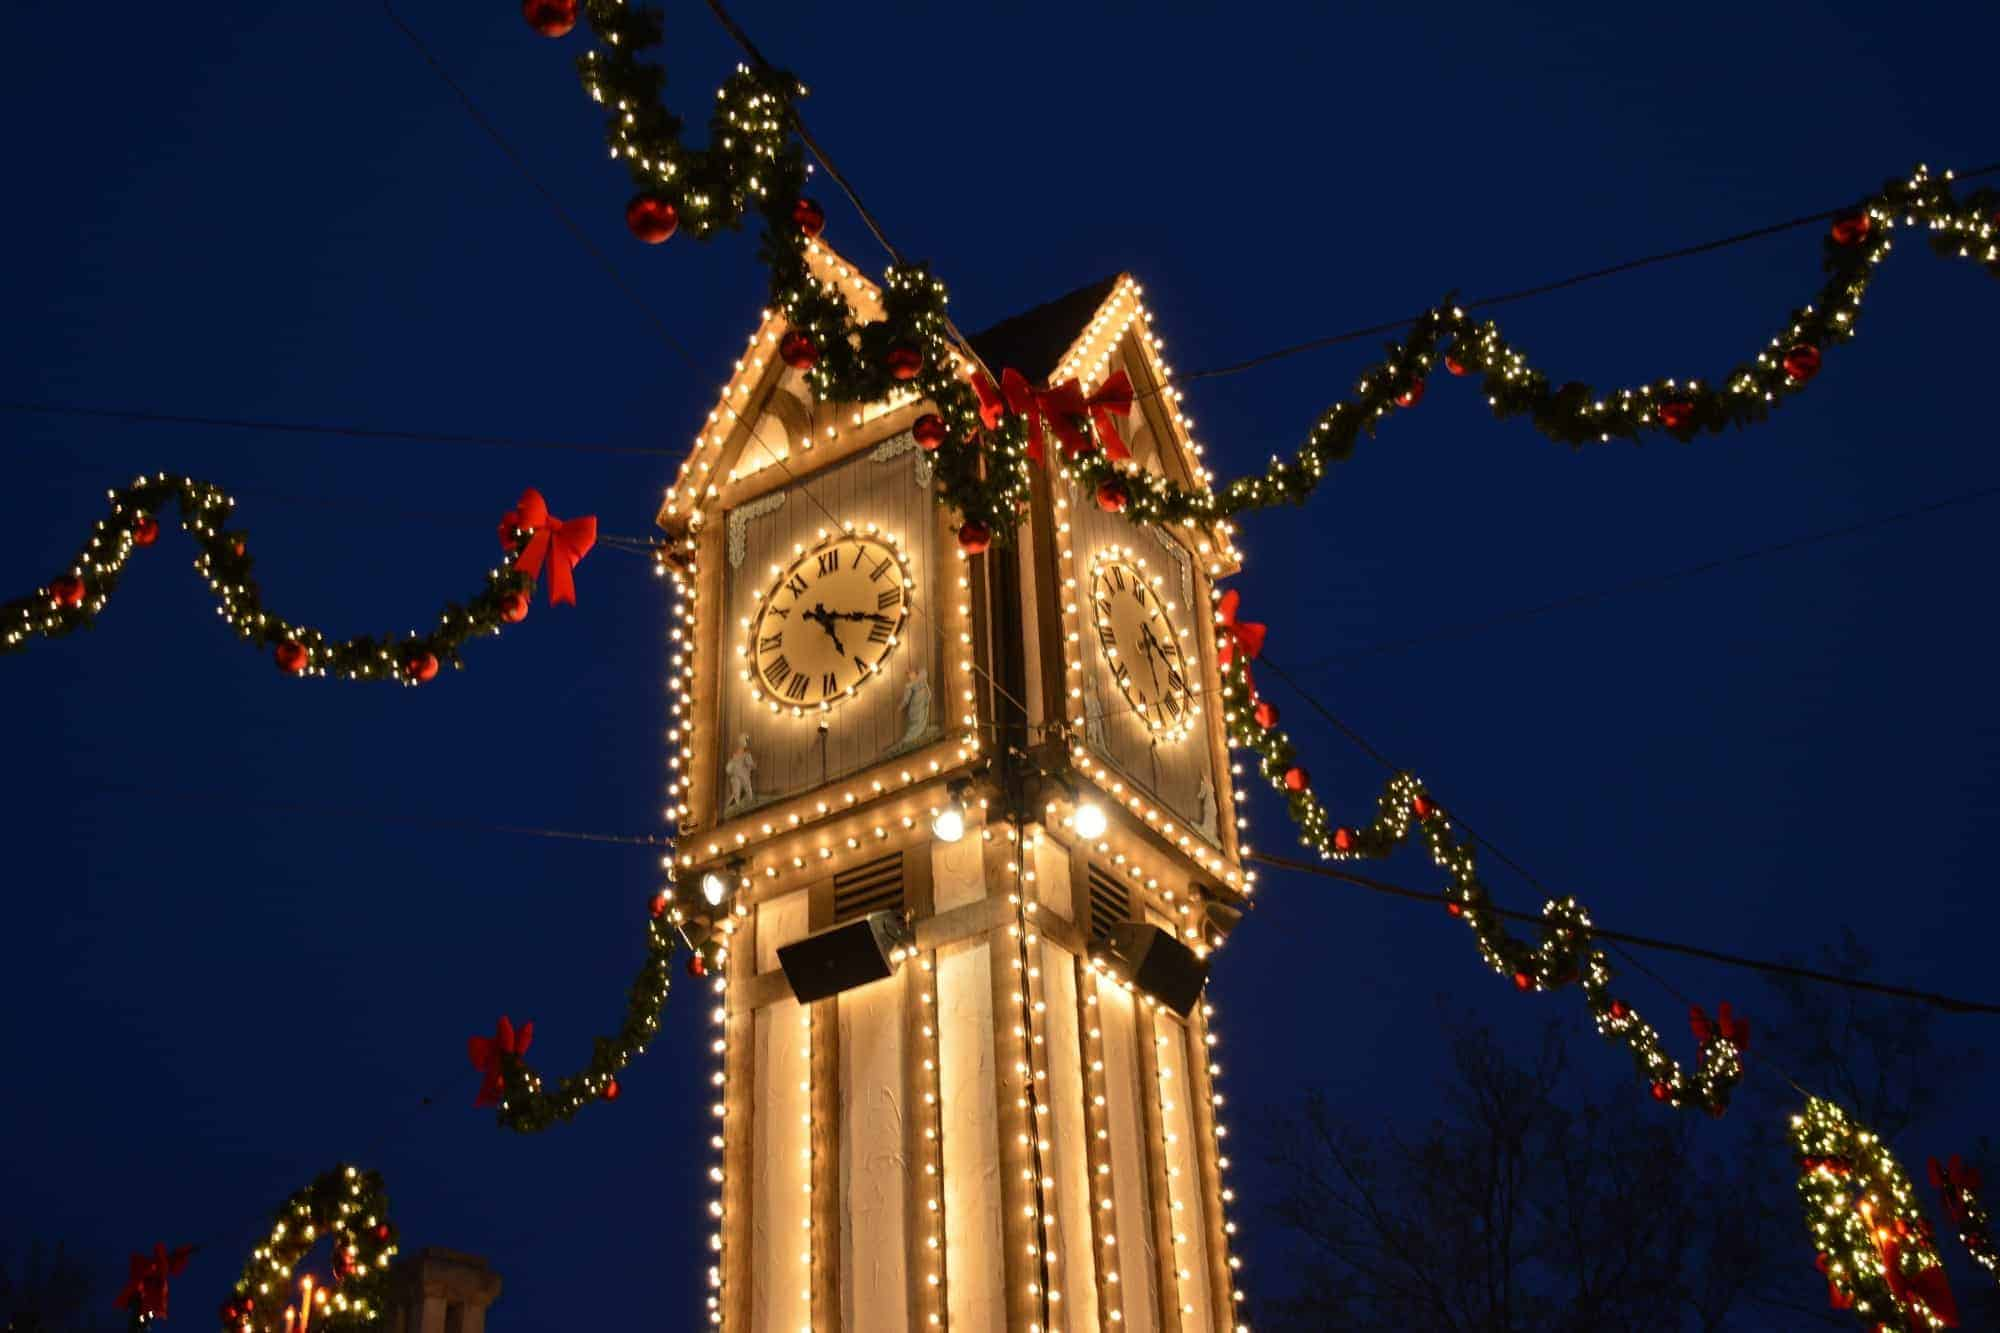 Williamsburg Christmas.Colonial Williamsburg Christmas And Other Williamsburg